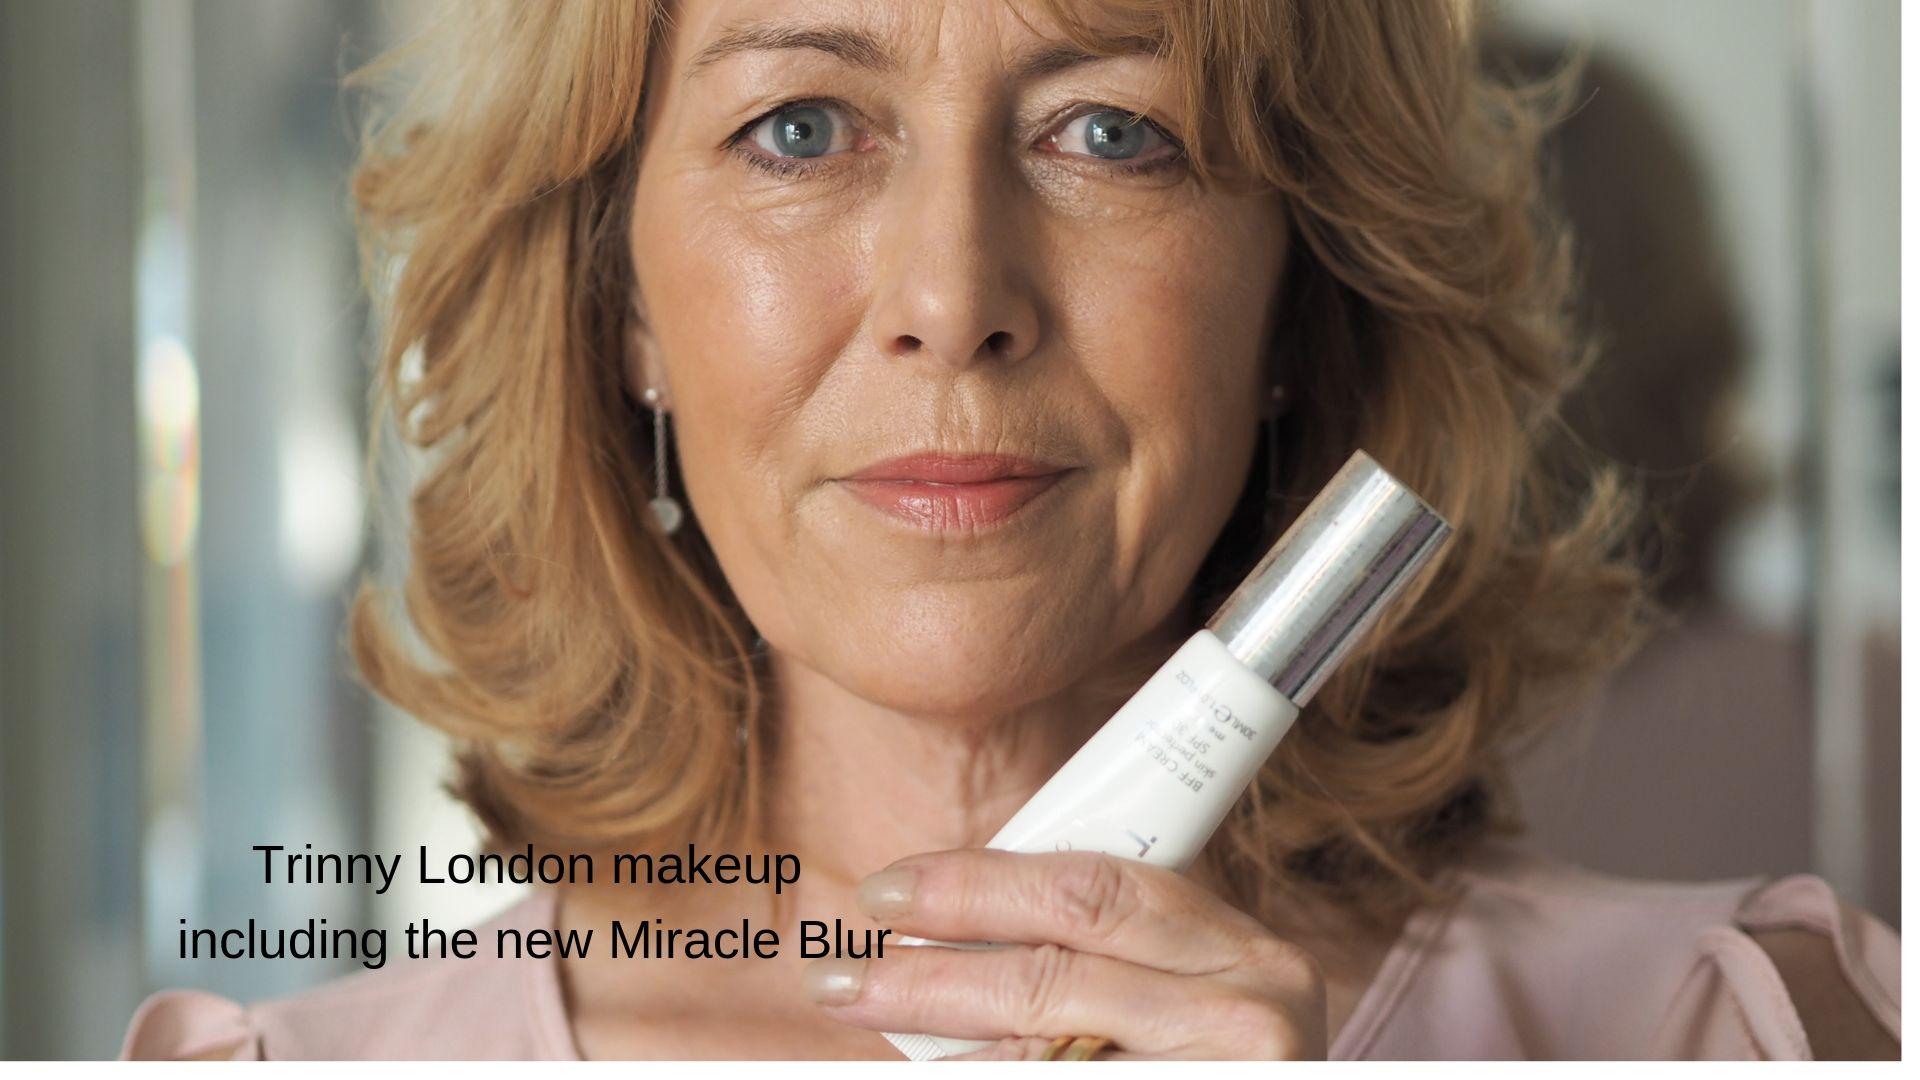 New Trinny London Make Up Review London makeup, Makeup